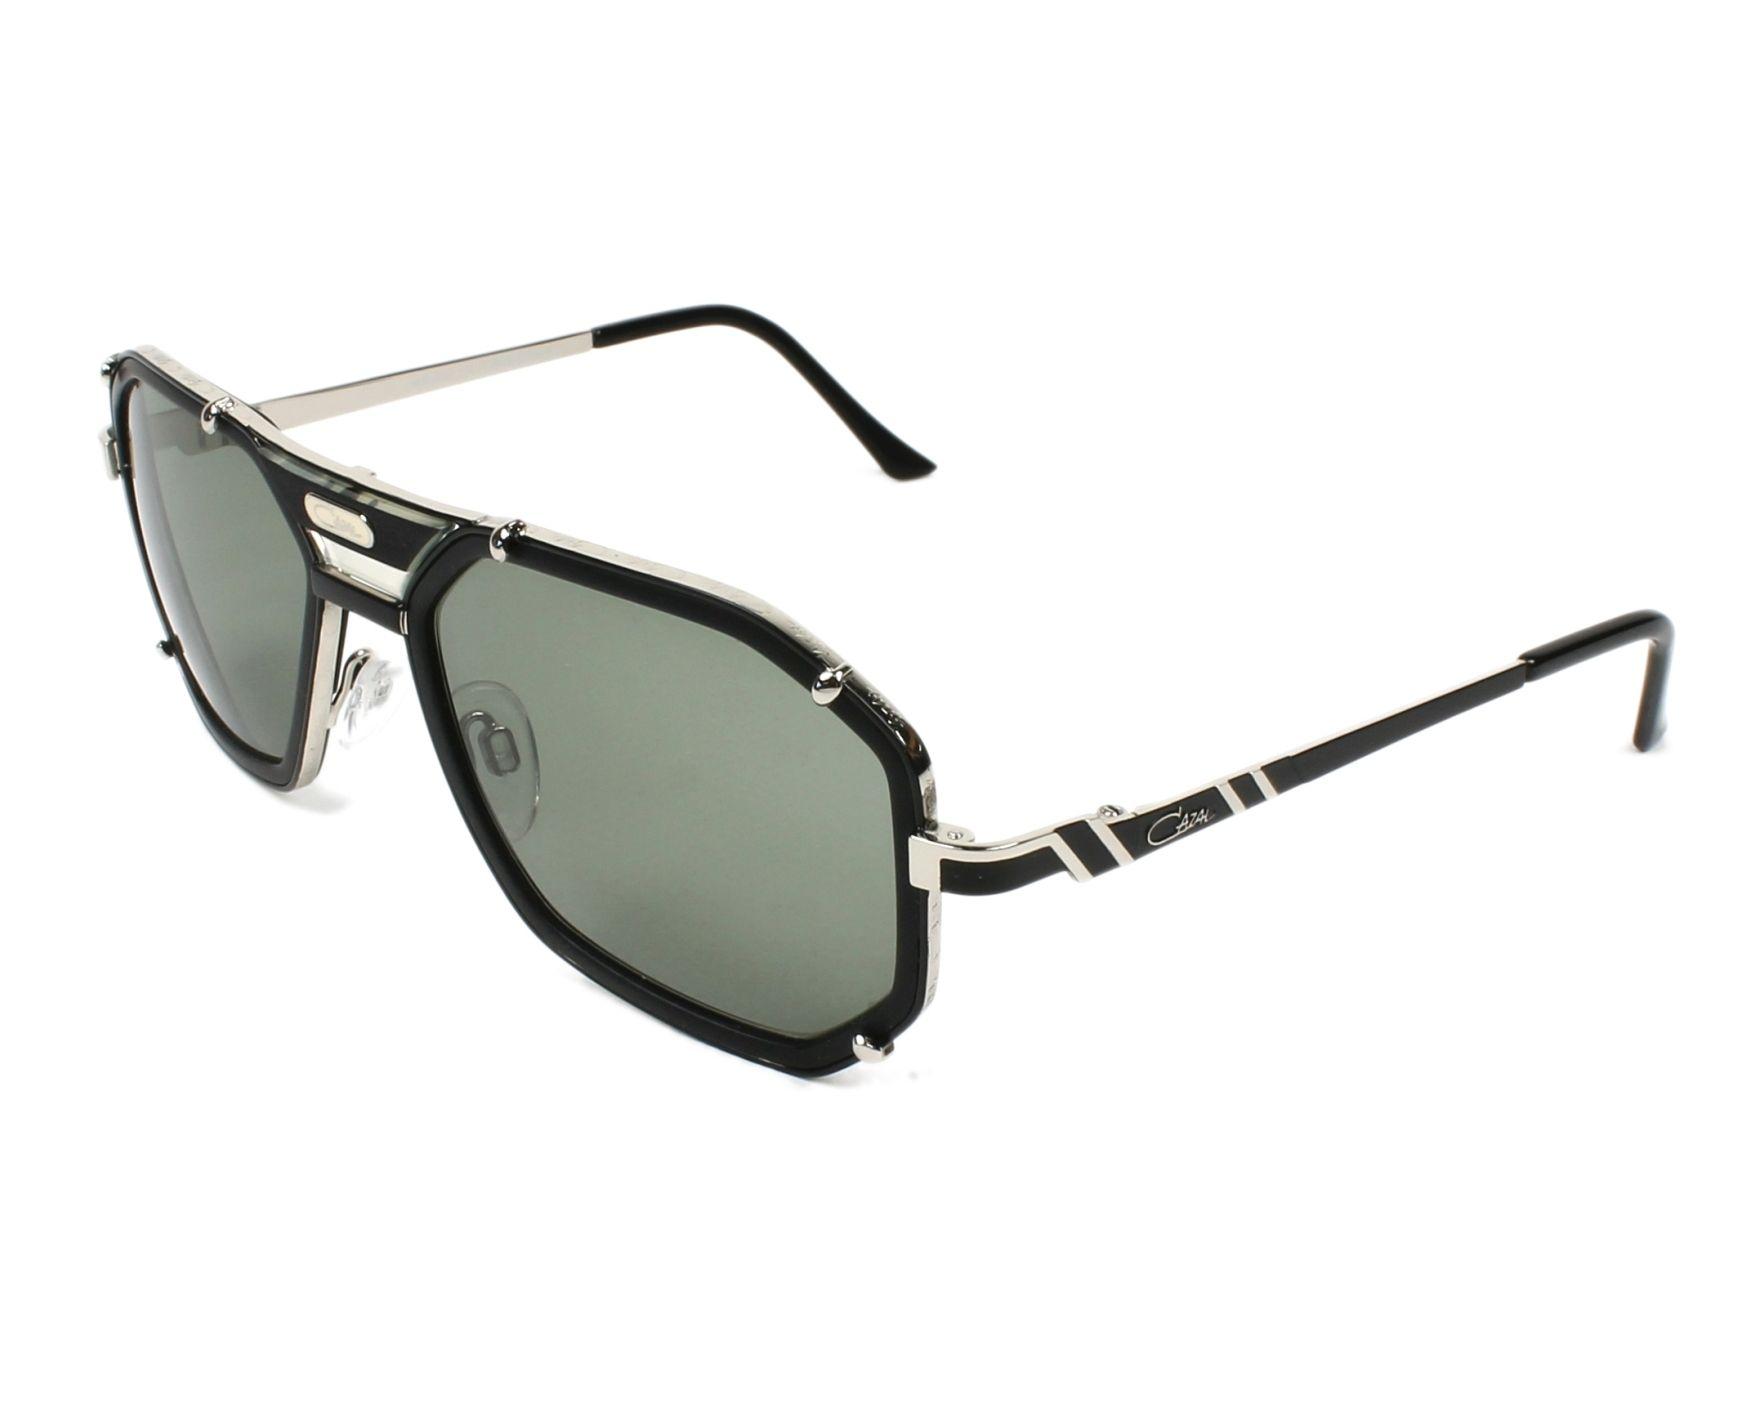 82ff2c22fb35 Cazal Sunglasses For Women